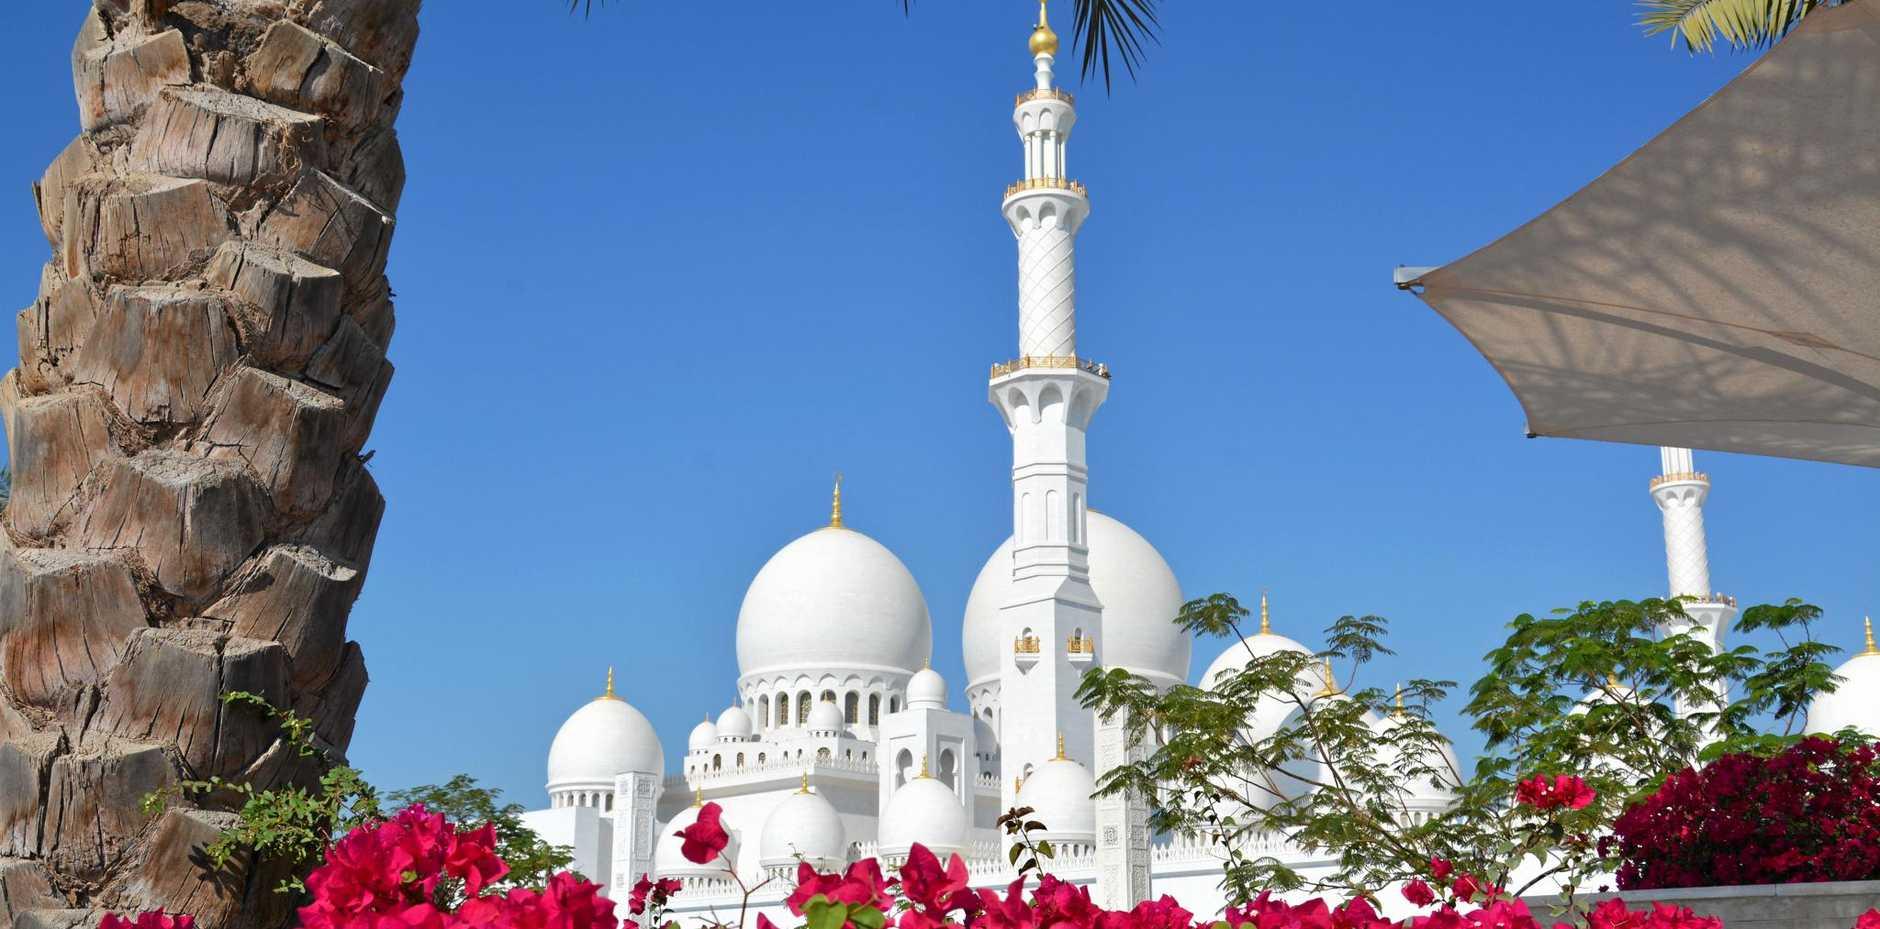 Sheikh Zayed Grand Mosque  in Abu Dhabi in the United Arab Emirates.